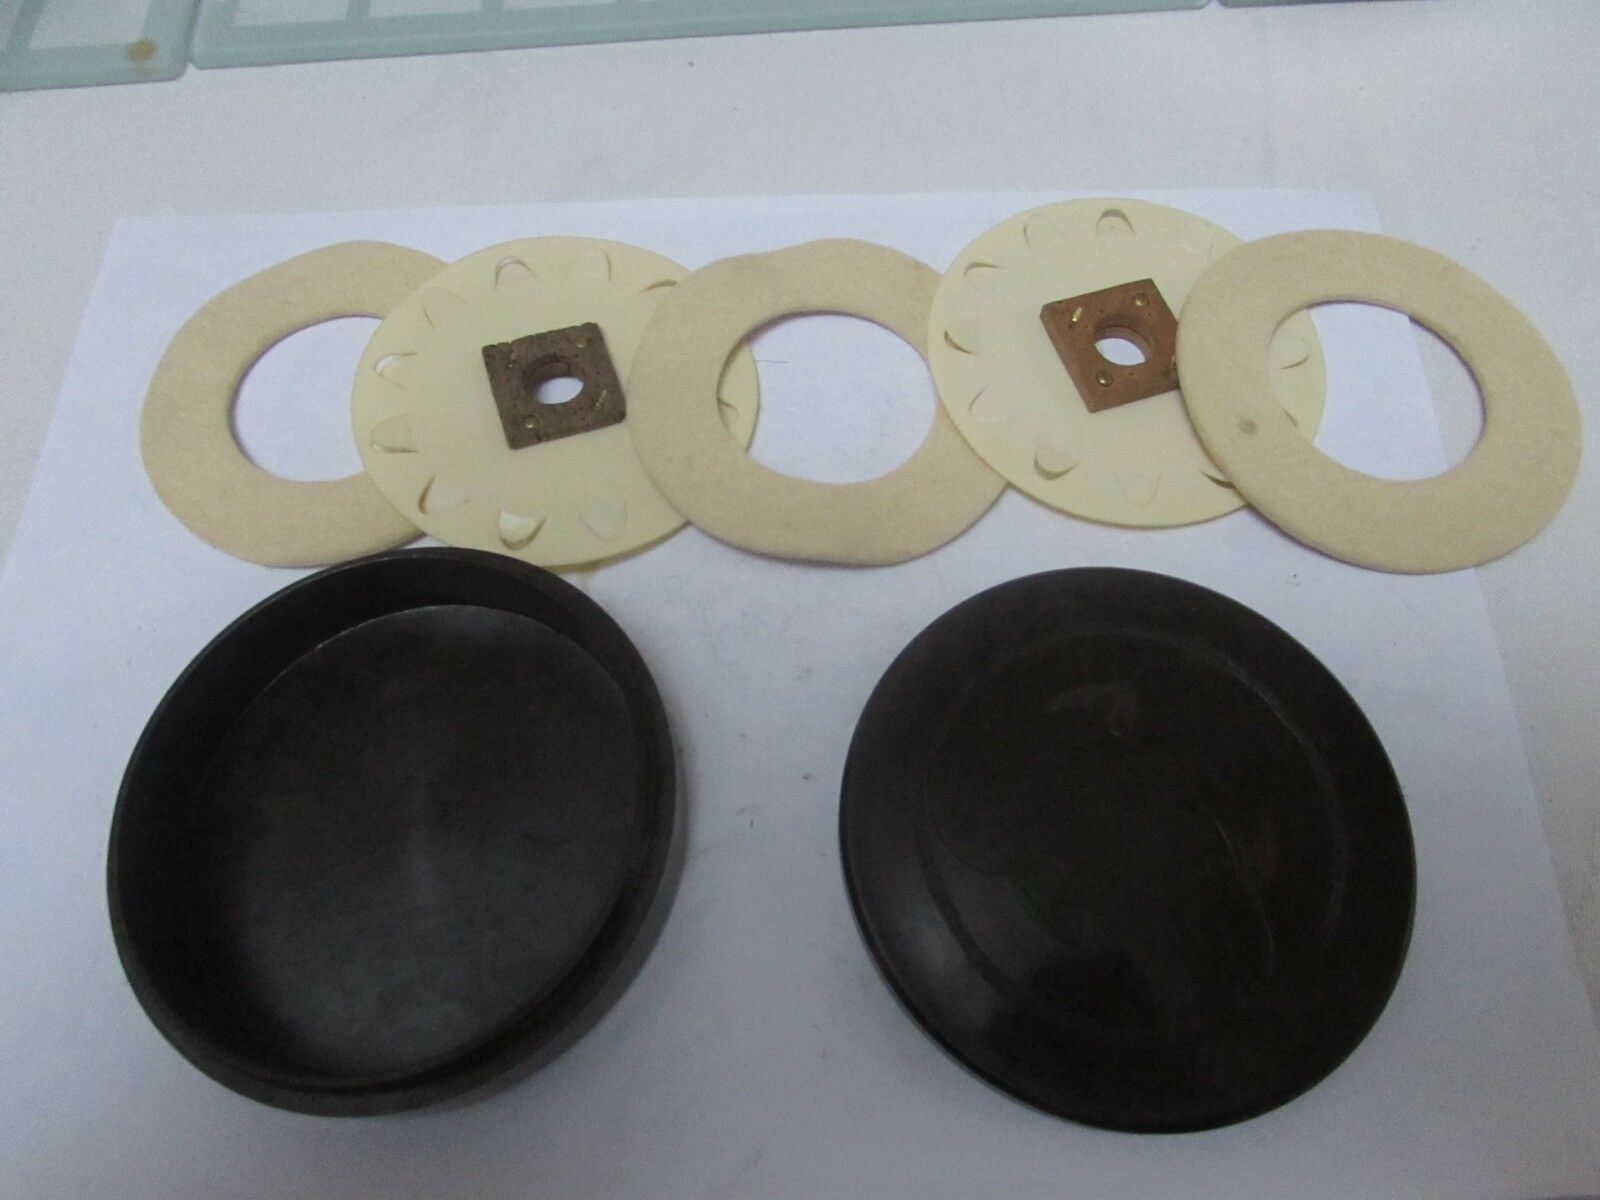 Excellent vintage hardy blackda circular bakelite cast fly fishing album case